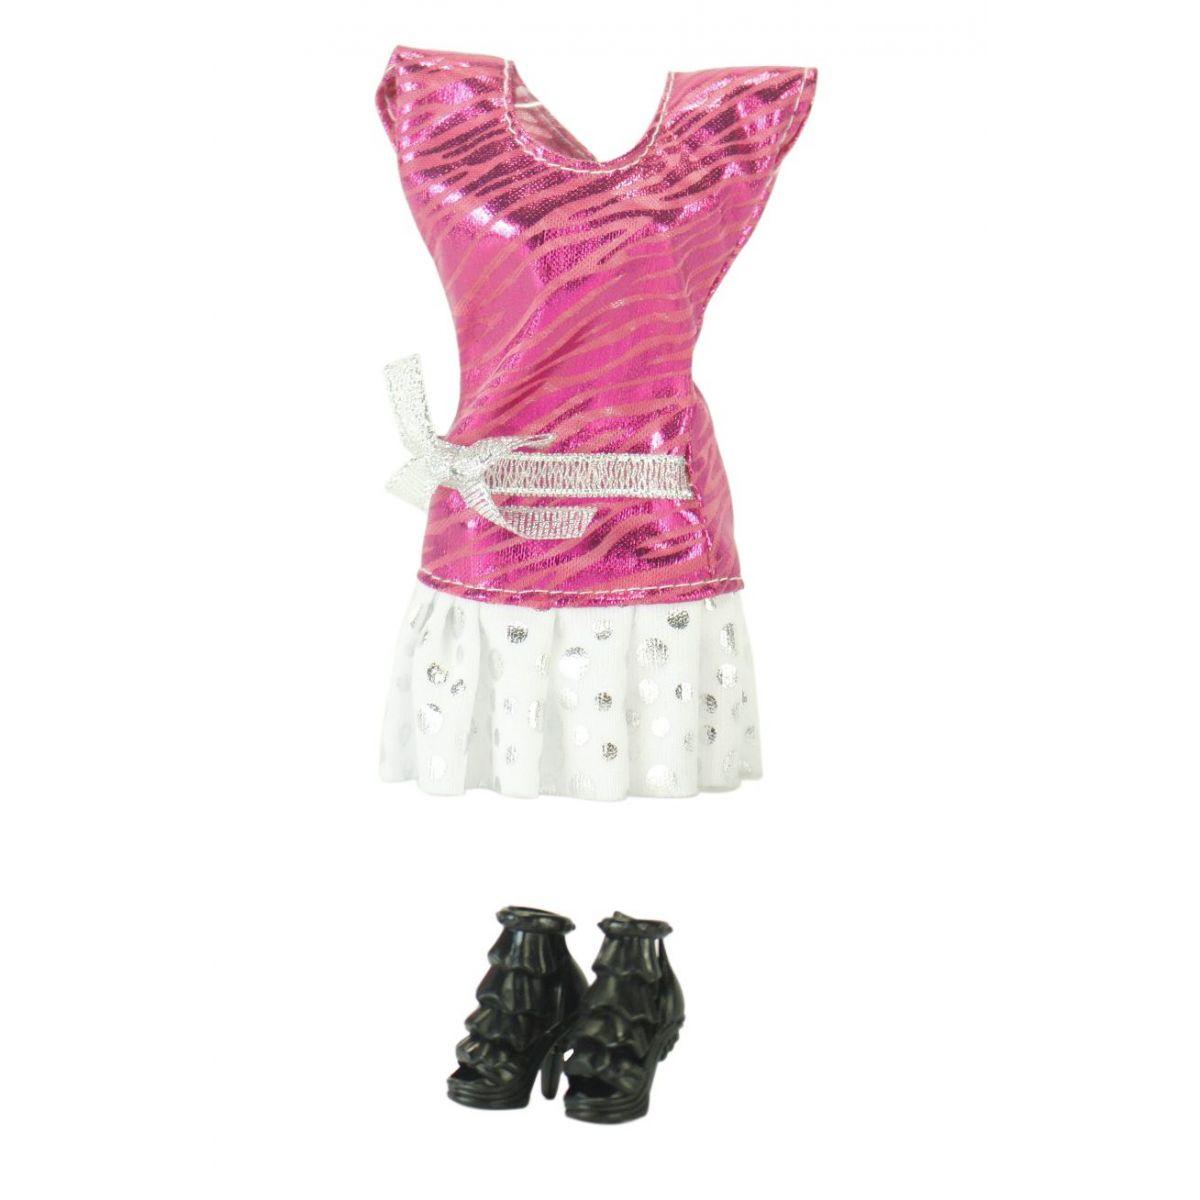 EPline Šatičky pro panenky s doplňky růžové šaty s bílou sukní